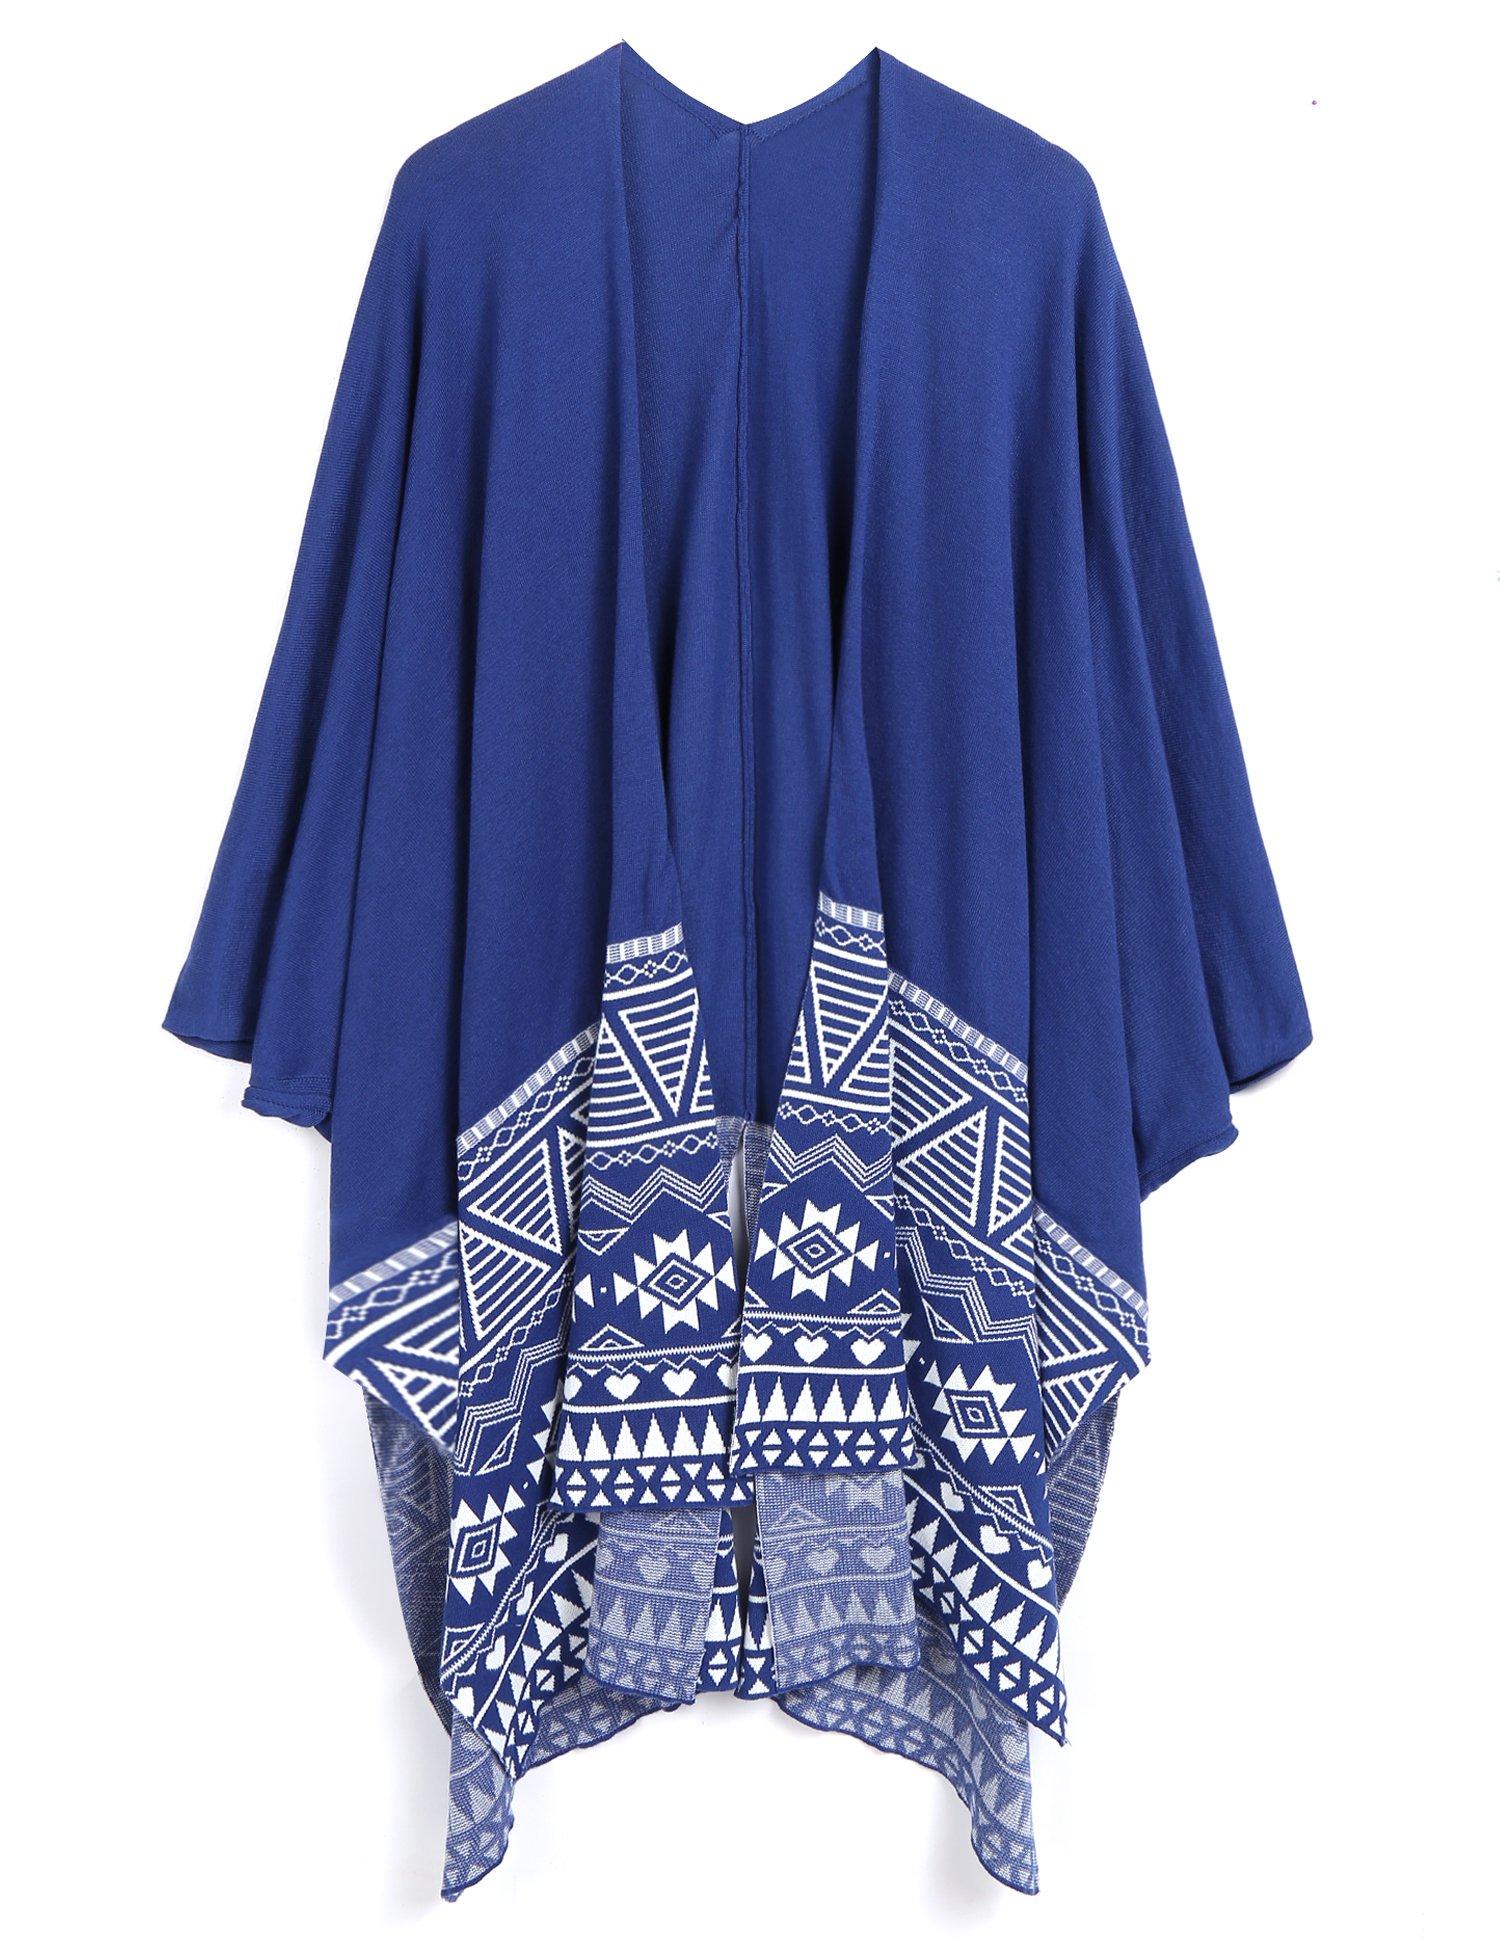 Coofandy Men's Hip Hop Tribal Style African Dashiki Shawl Wrap Cardigan Sweater